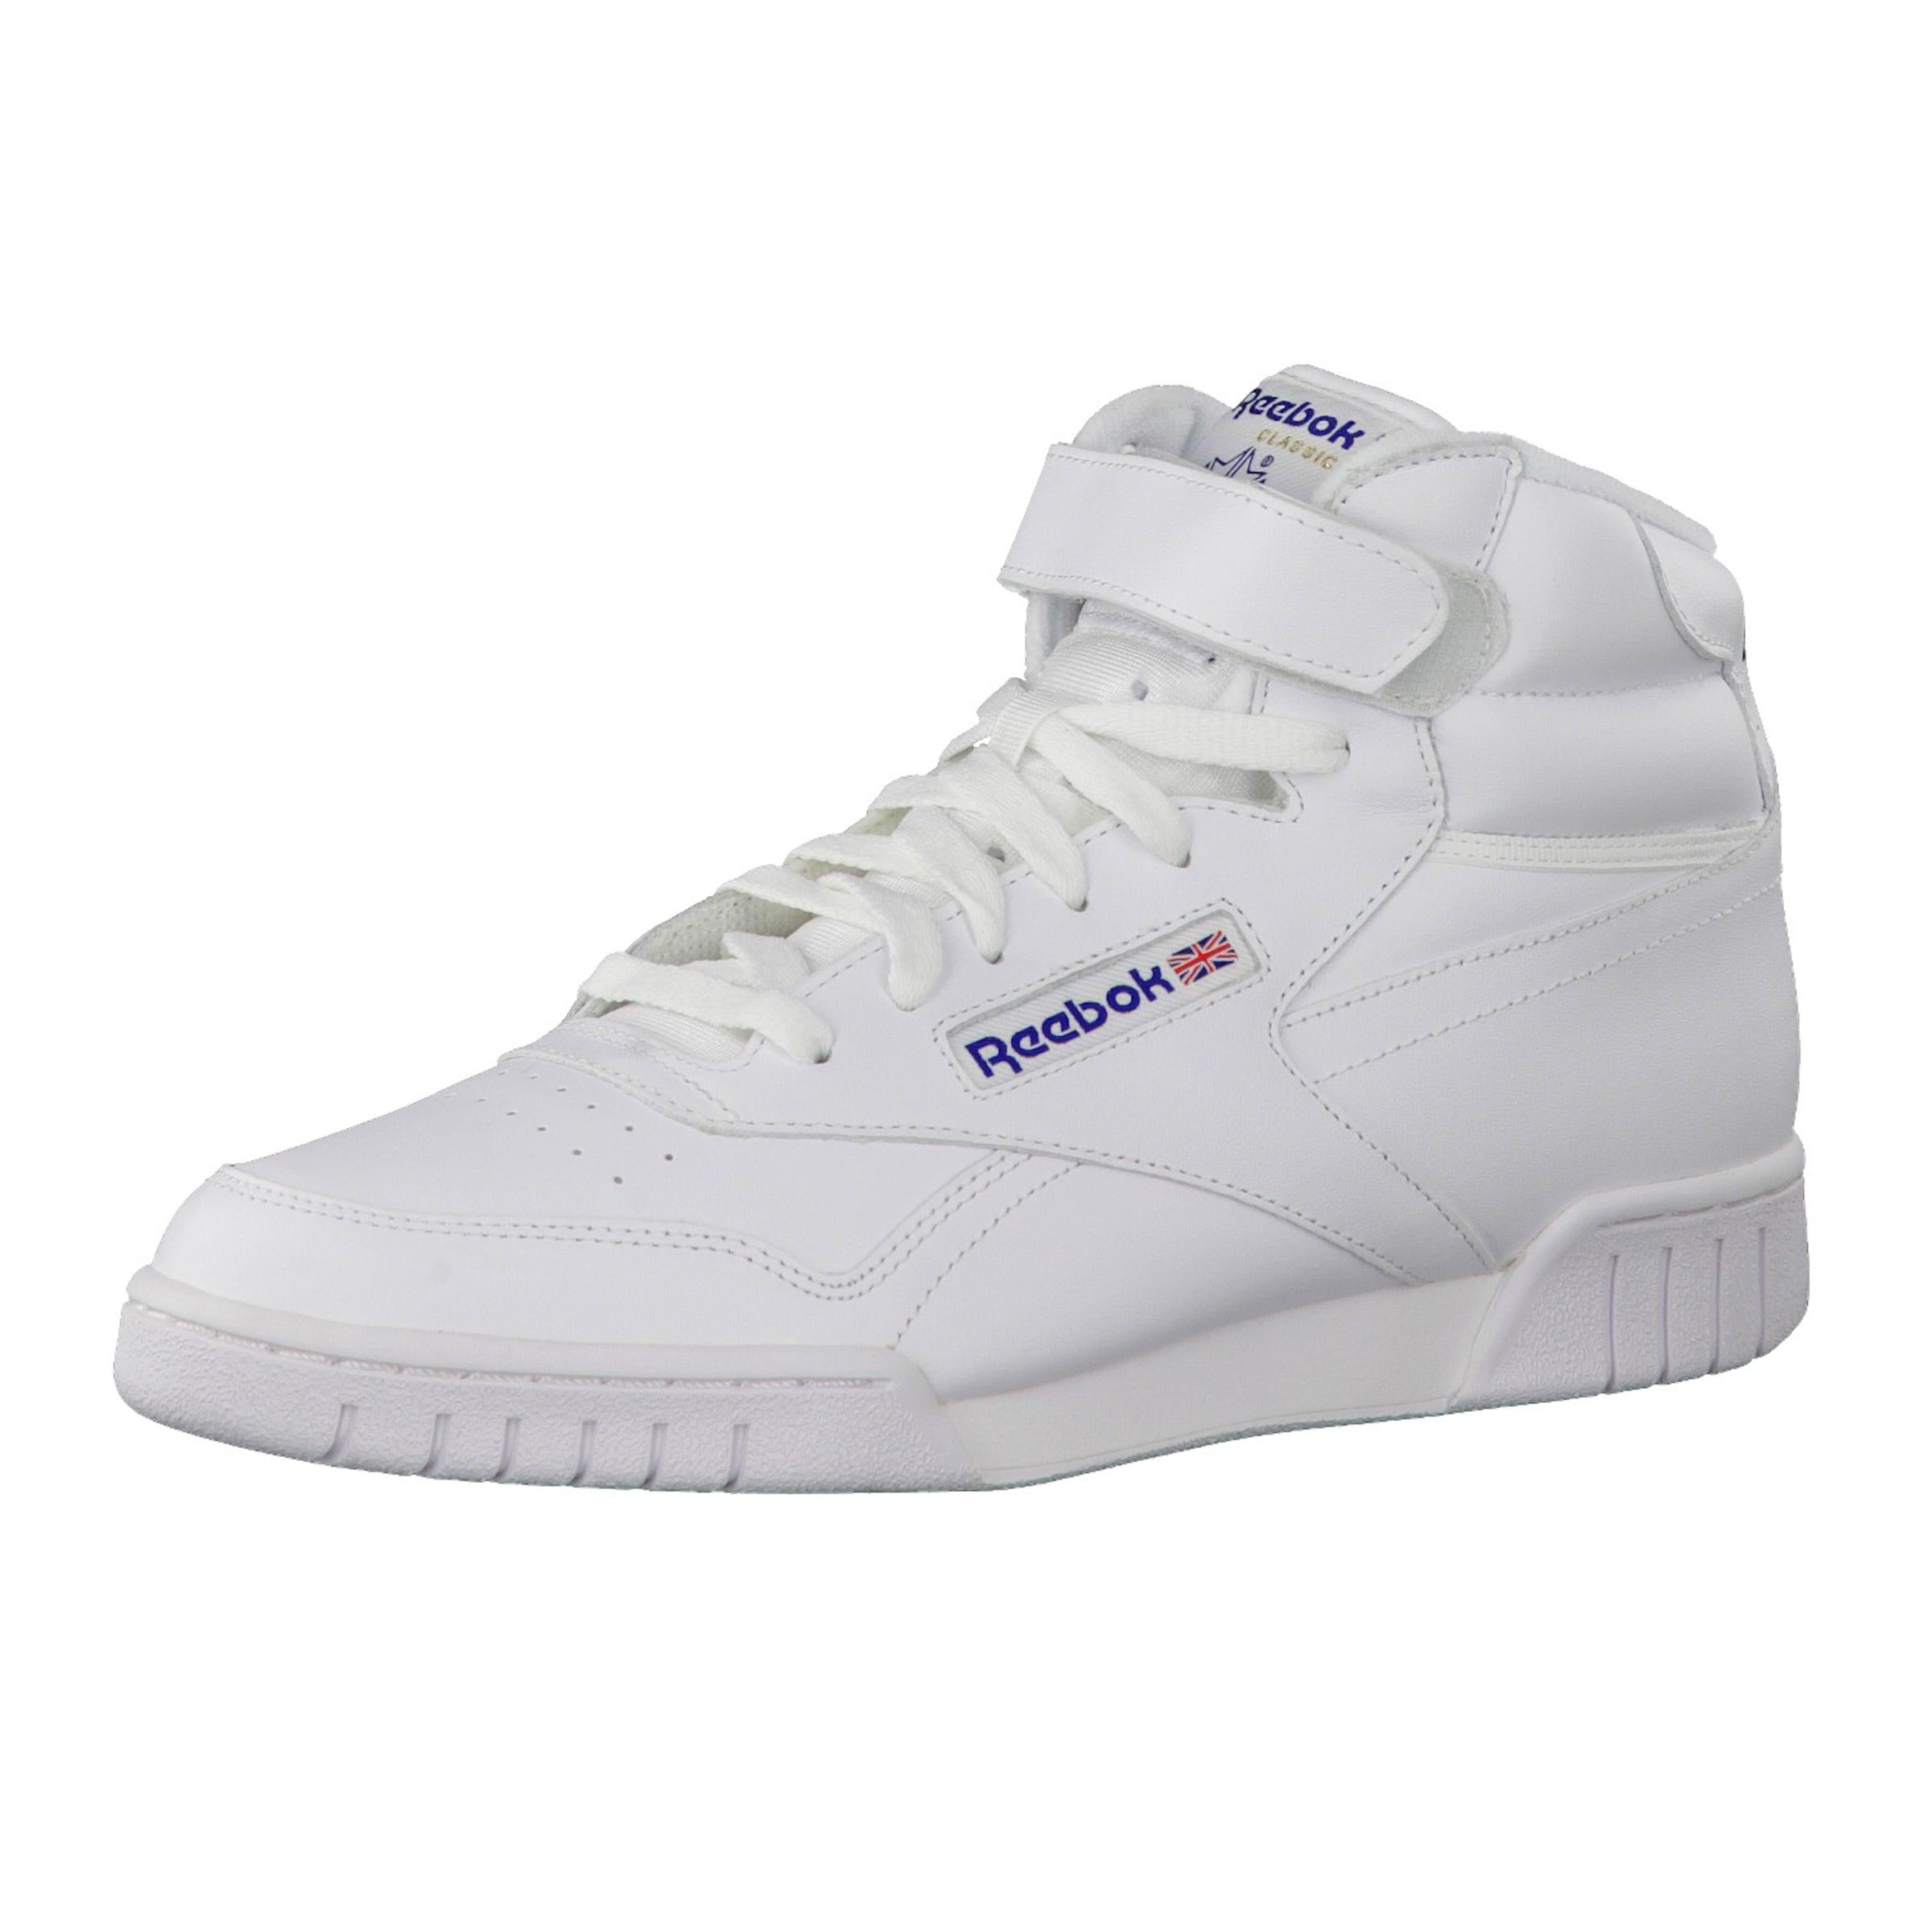 Reebok classic Sneaker Ex-O-Fit Hi Hohe Qualität